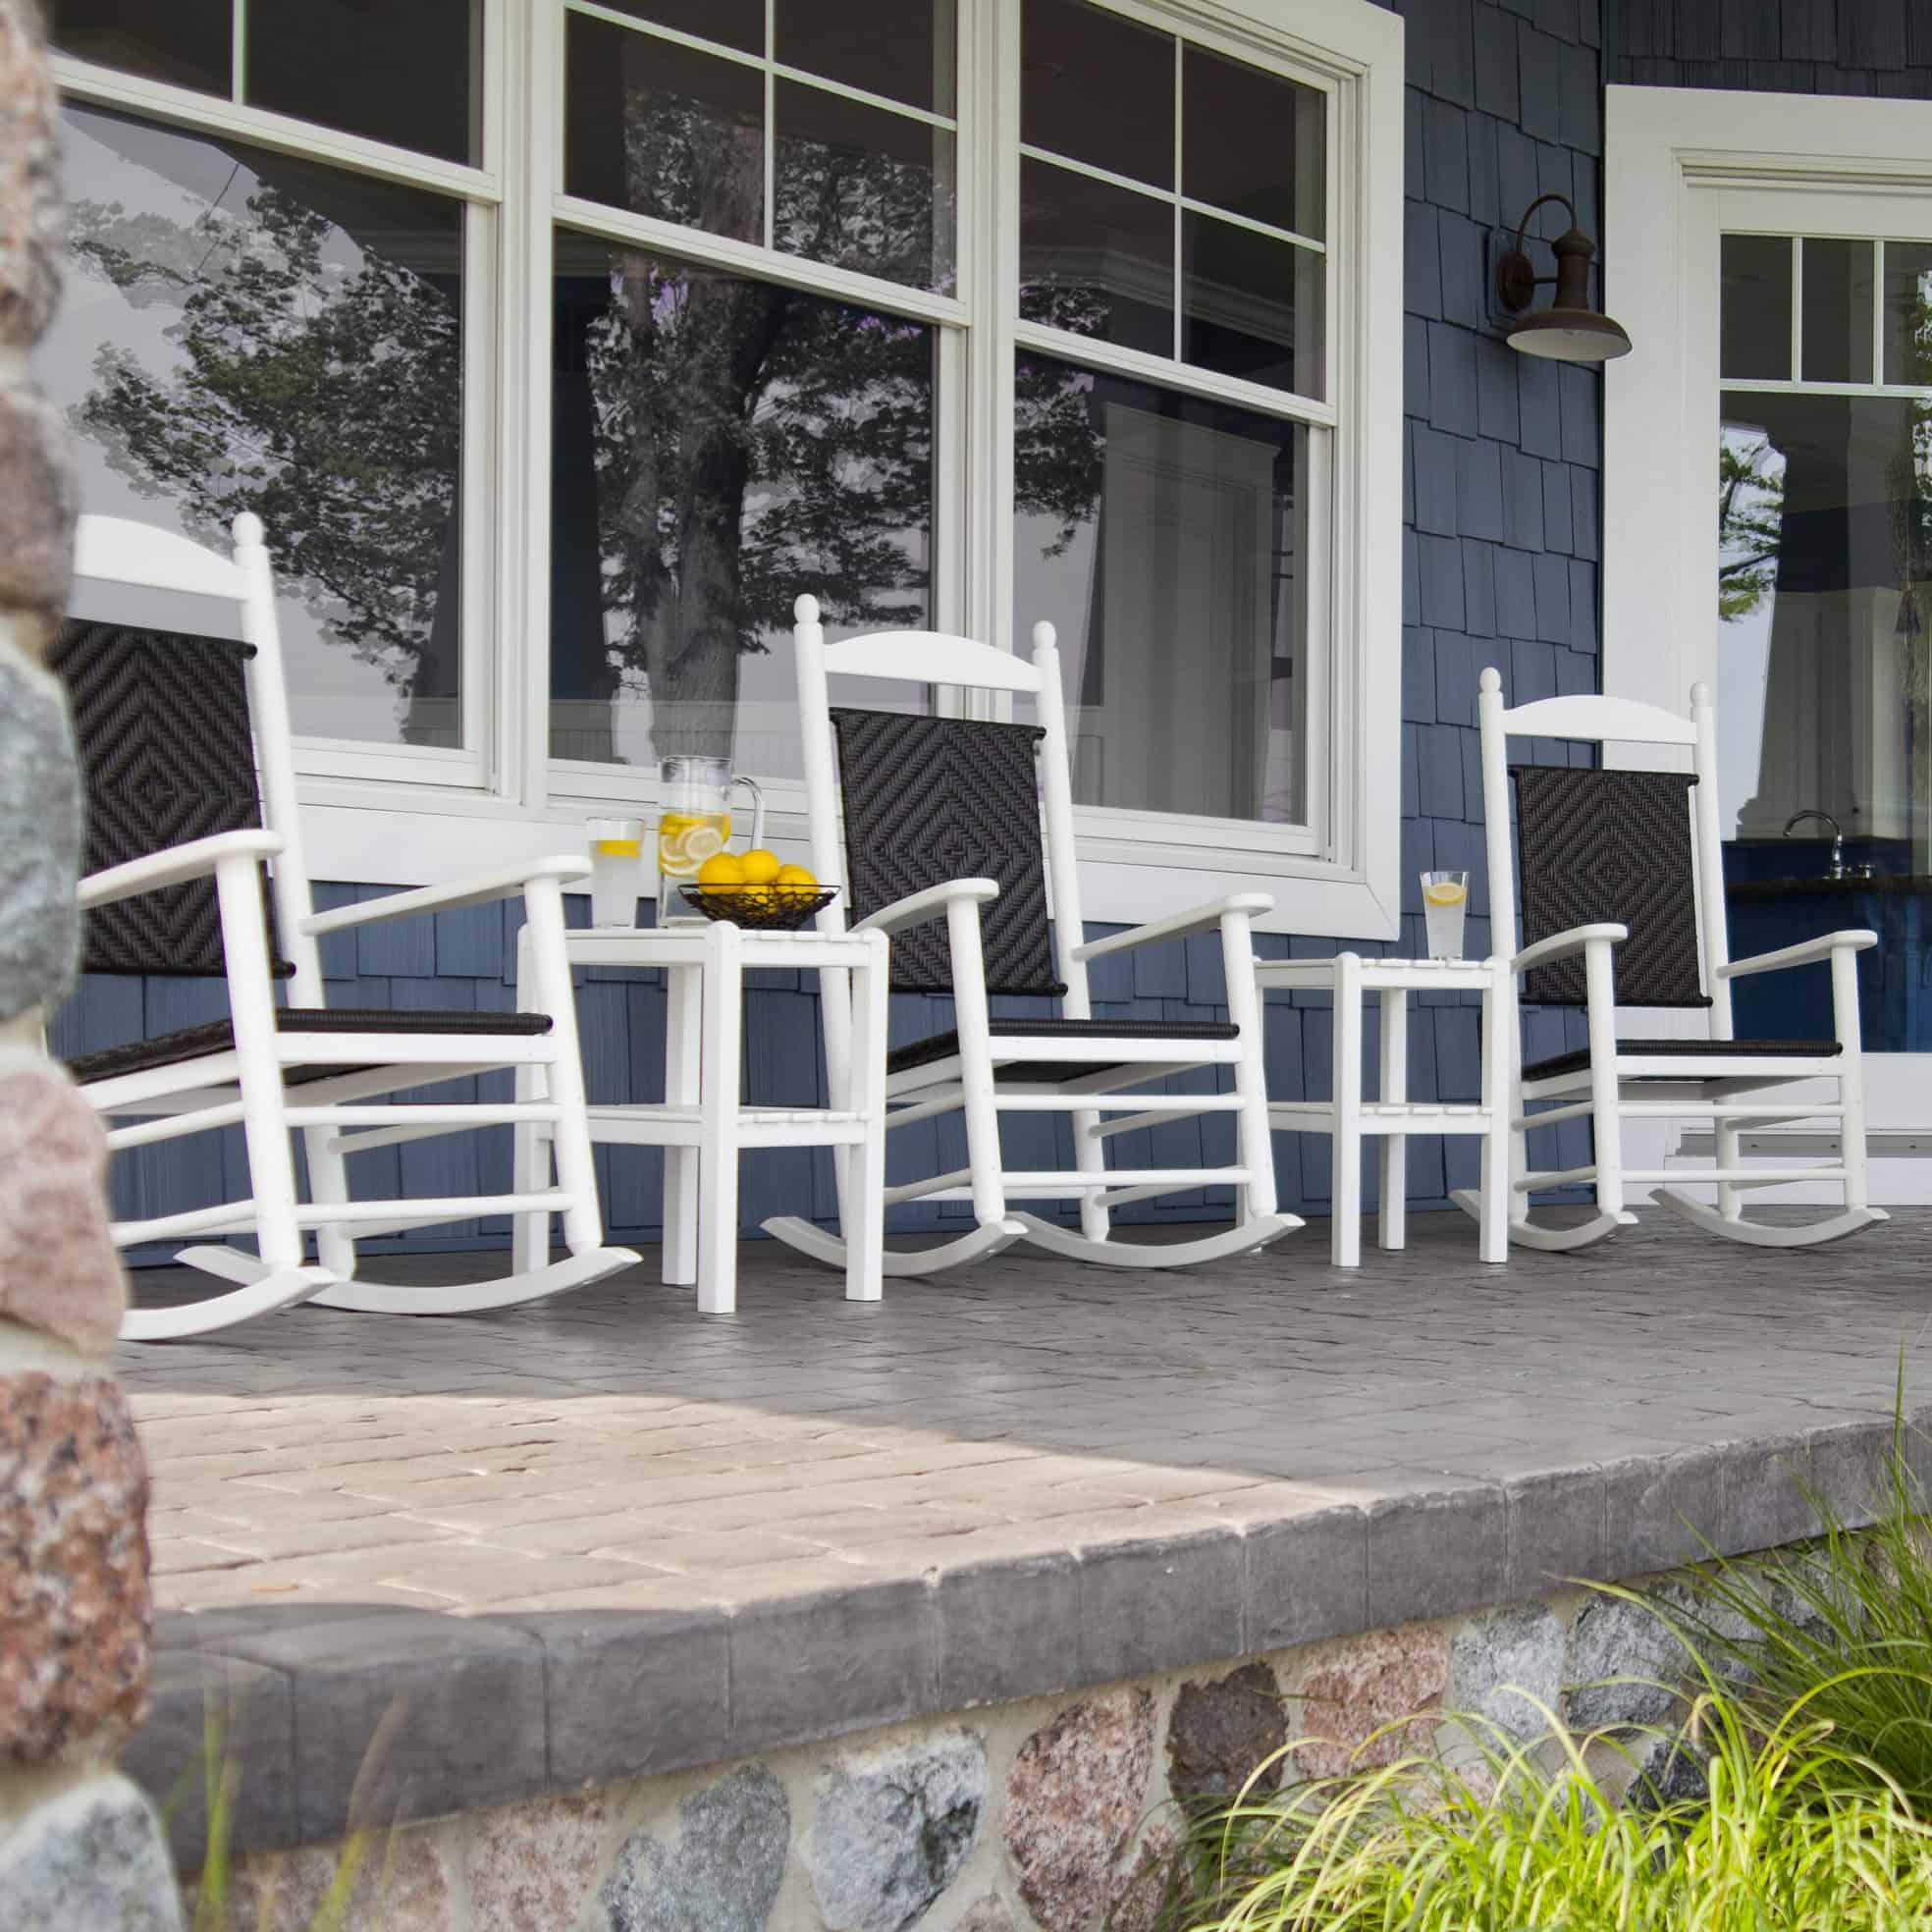 15 Super Simple Back Porch Ideas on Simple Back Deck Ideas id=33736